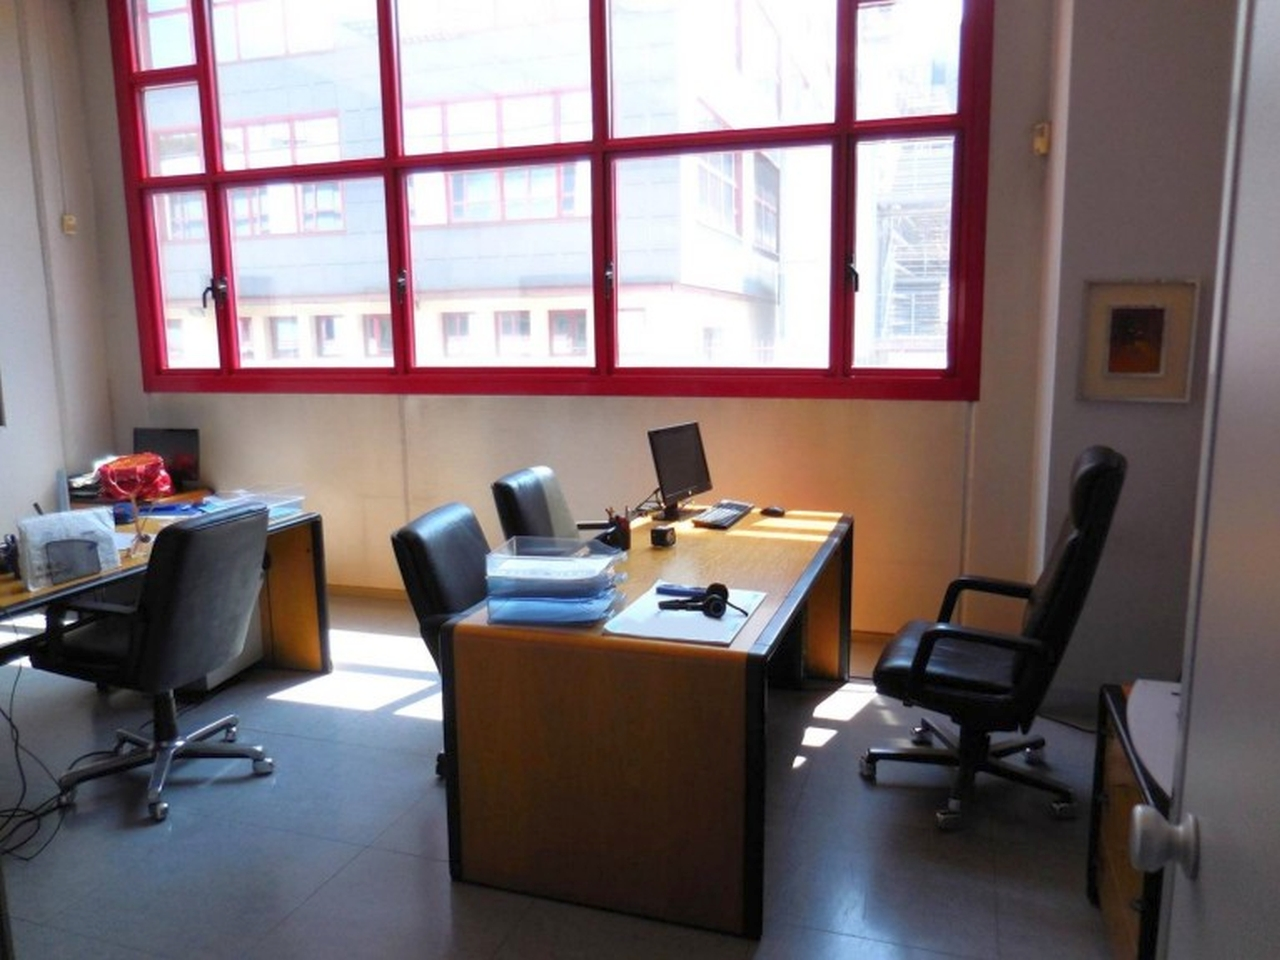 Laboratorio in Vendita  in Lombardia - RIF. MVER002